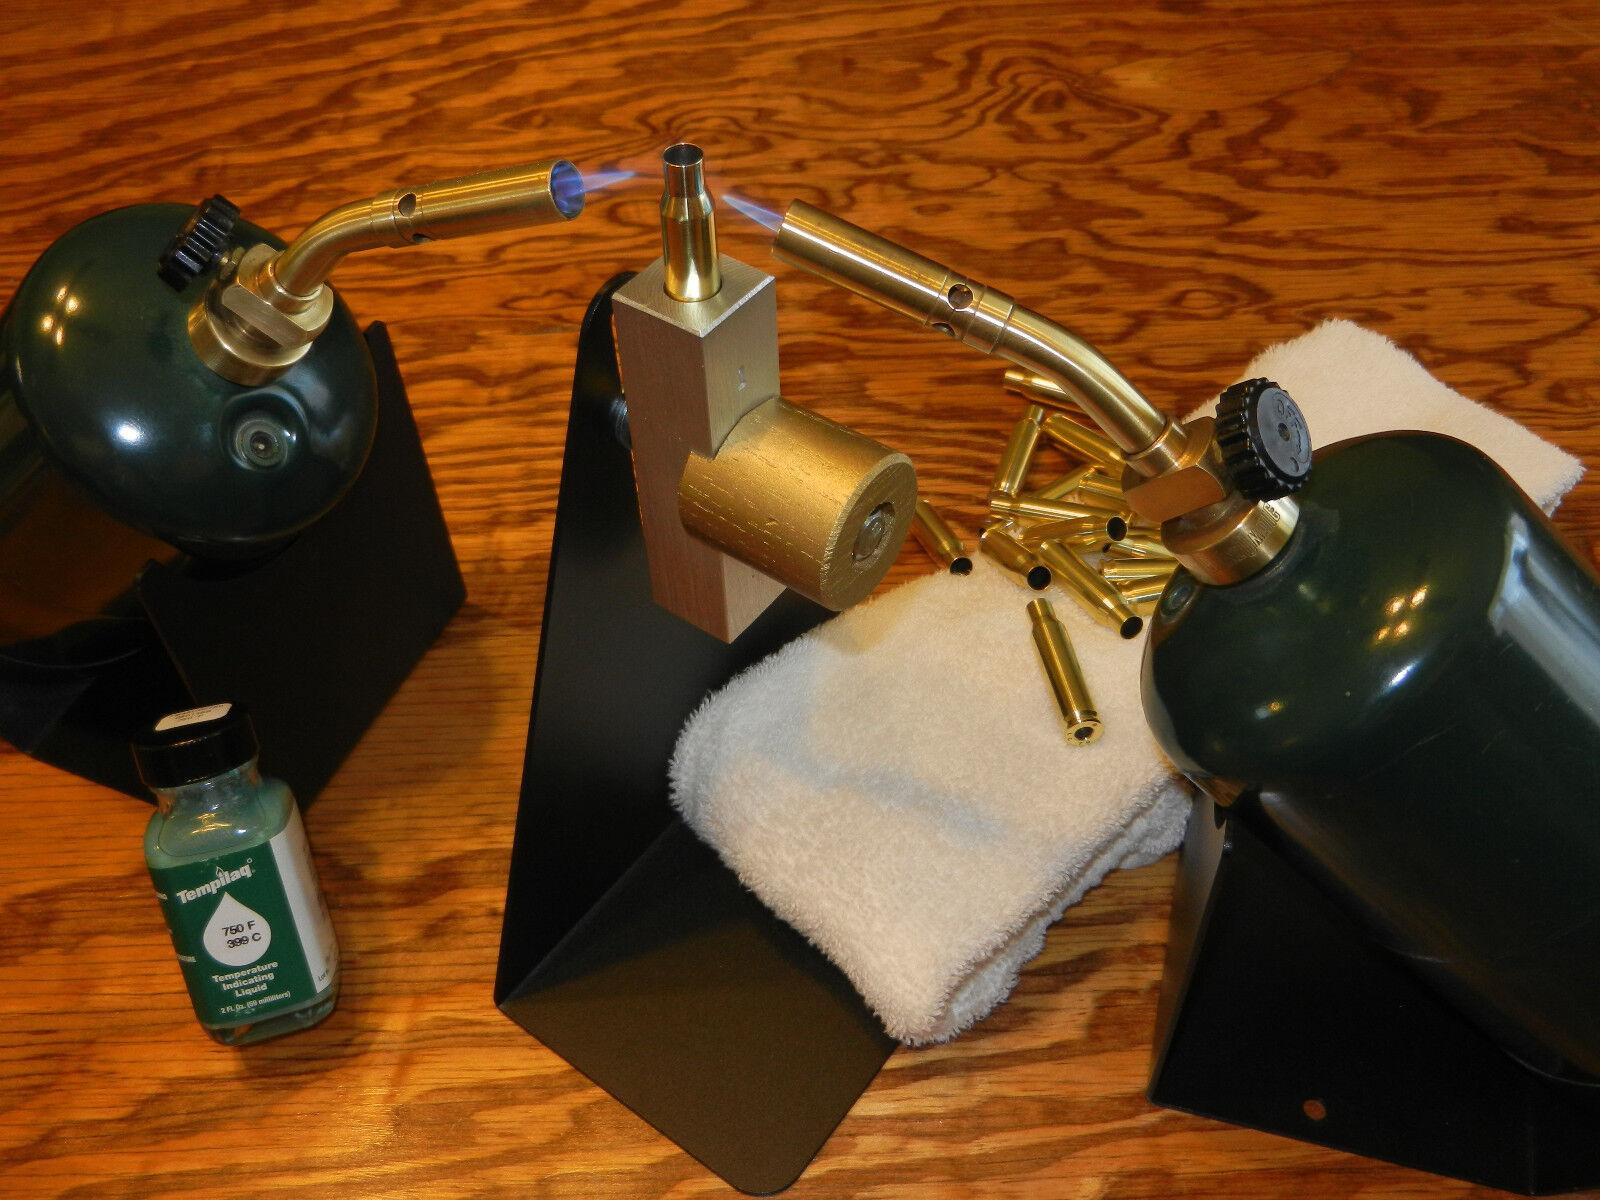 Anneal Cartridge Brass, Anneal-Rite w Holder, .41 Swiss & 1 - 750 Tempilaq